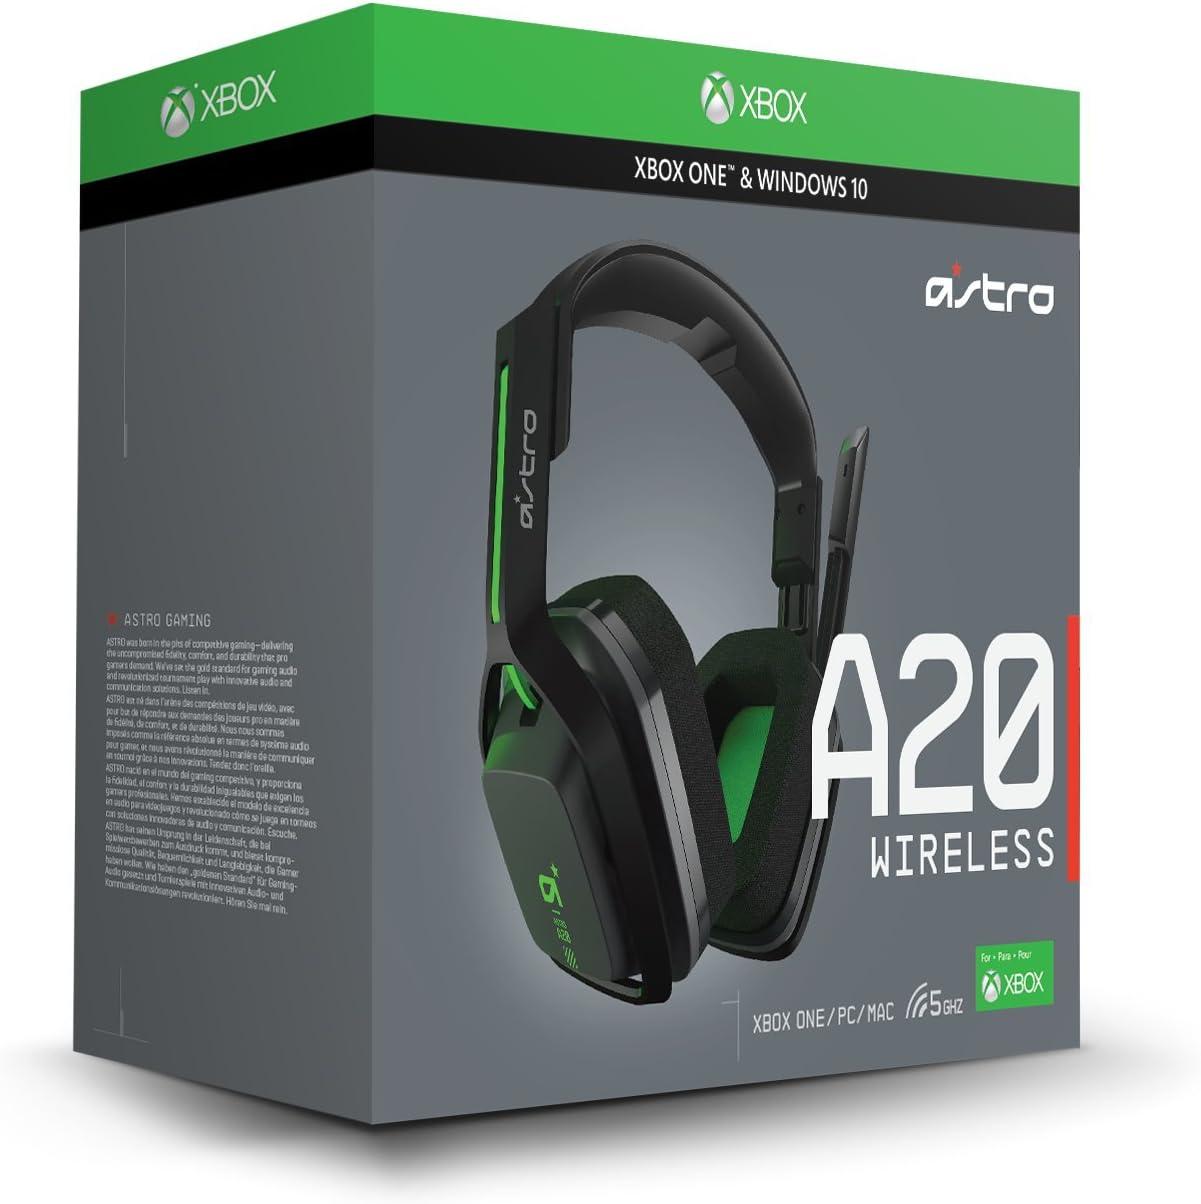 Amazon.com: ASTRO Gaming A20 Wireless Headset, Black/Green - Xbox ...